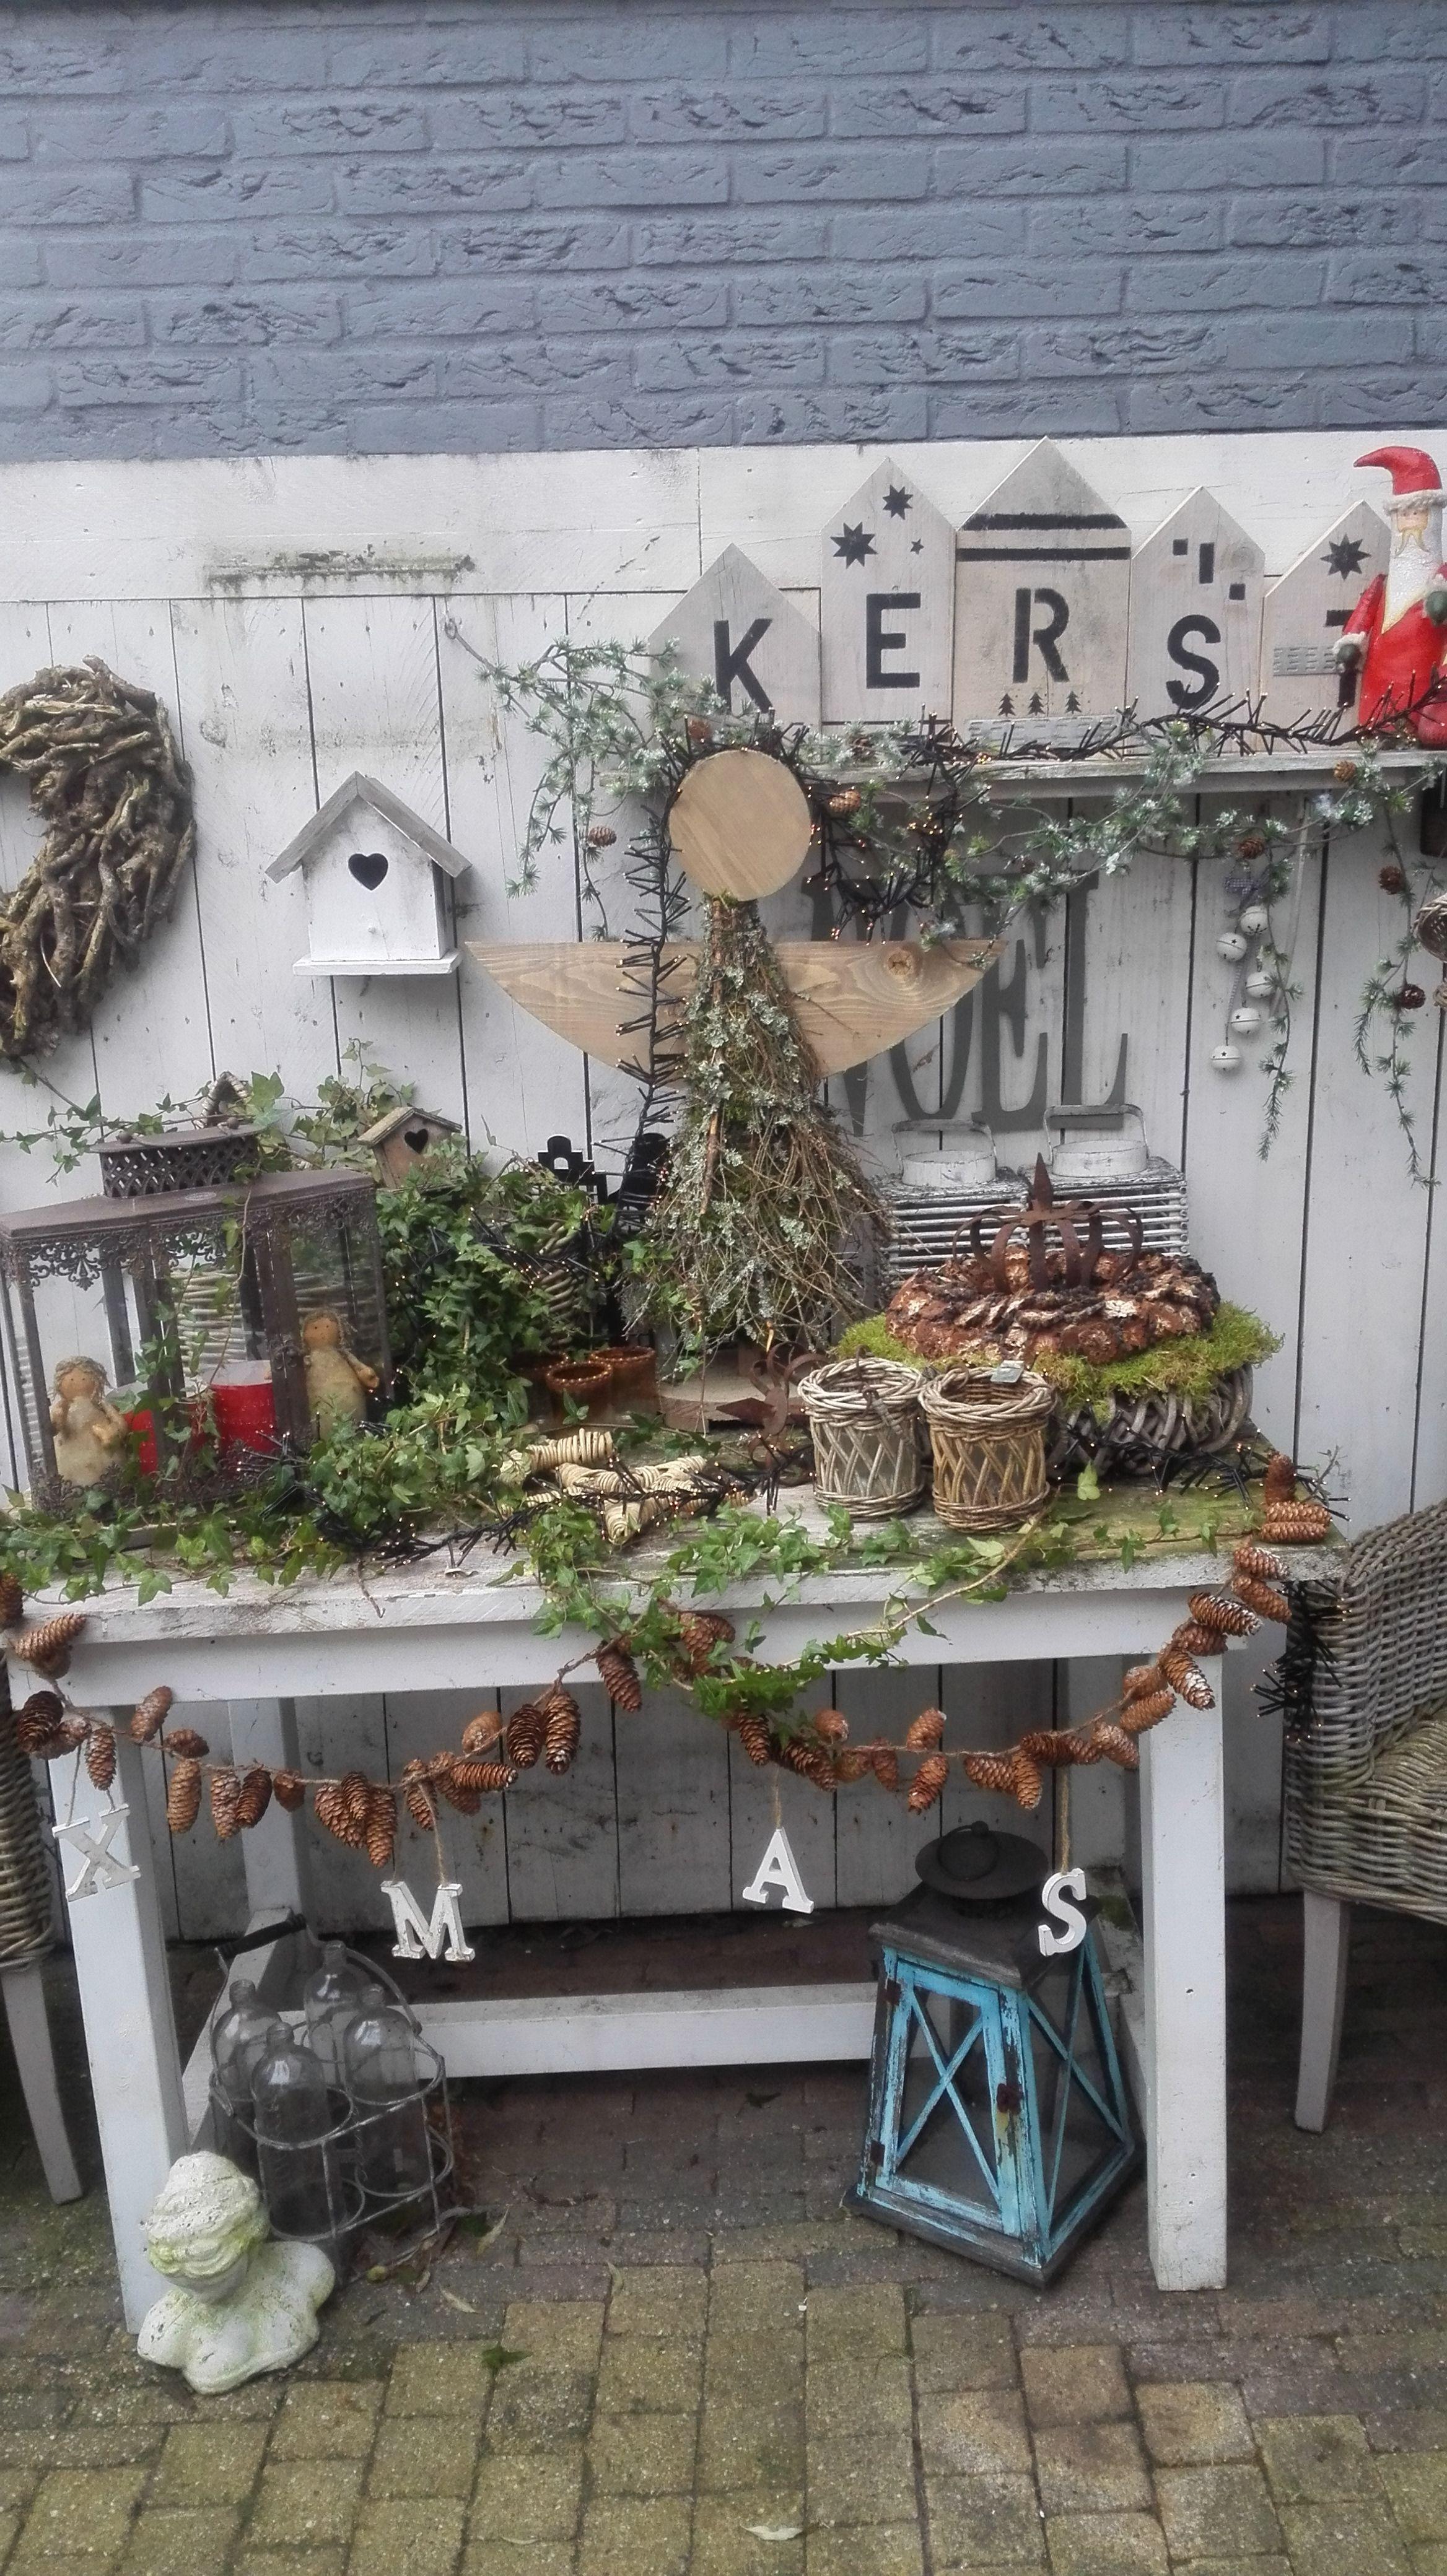 Kerst Buiten Decoratie Kerst Boerderij Kerst Kerst Trap